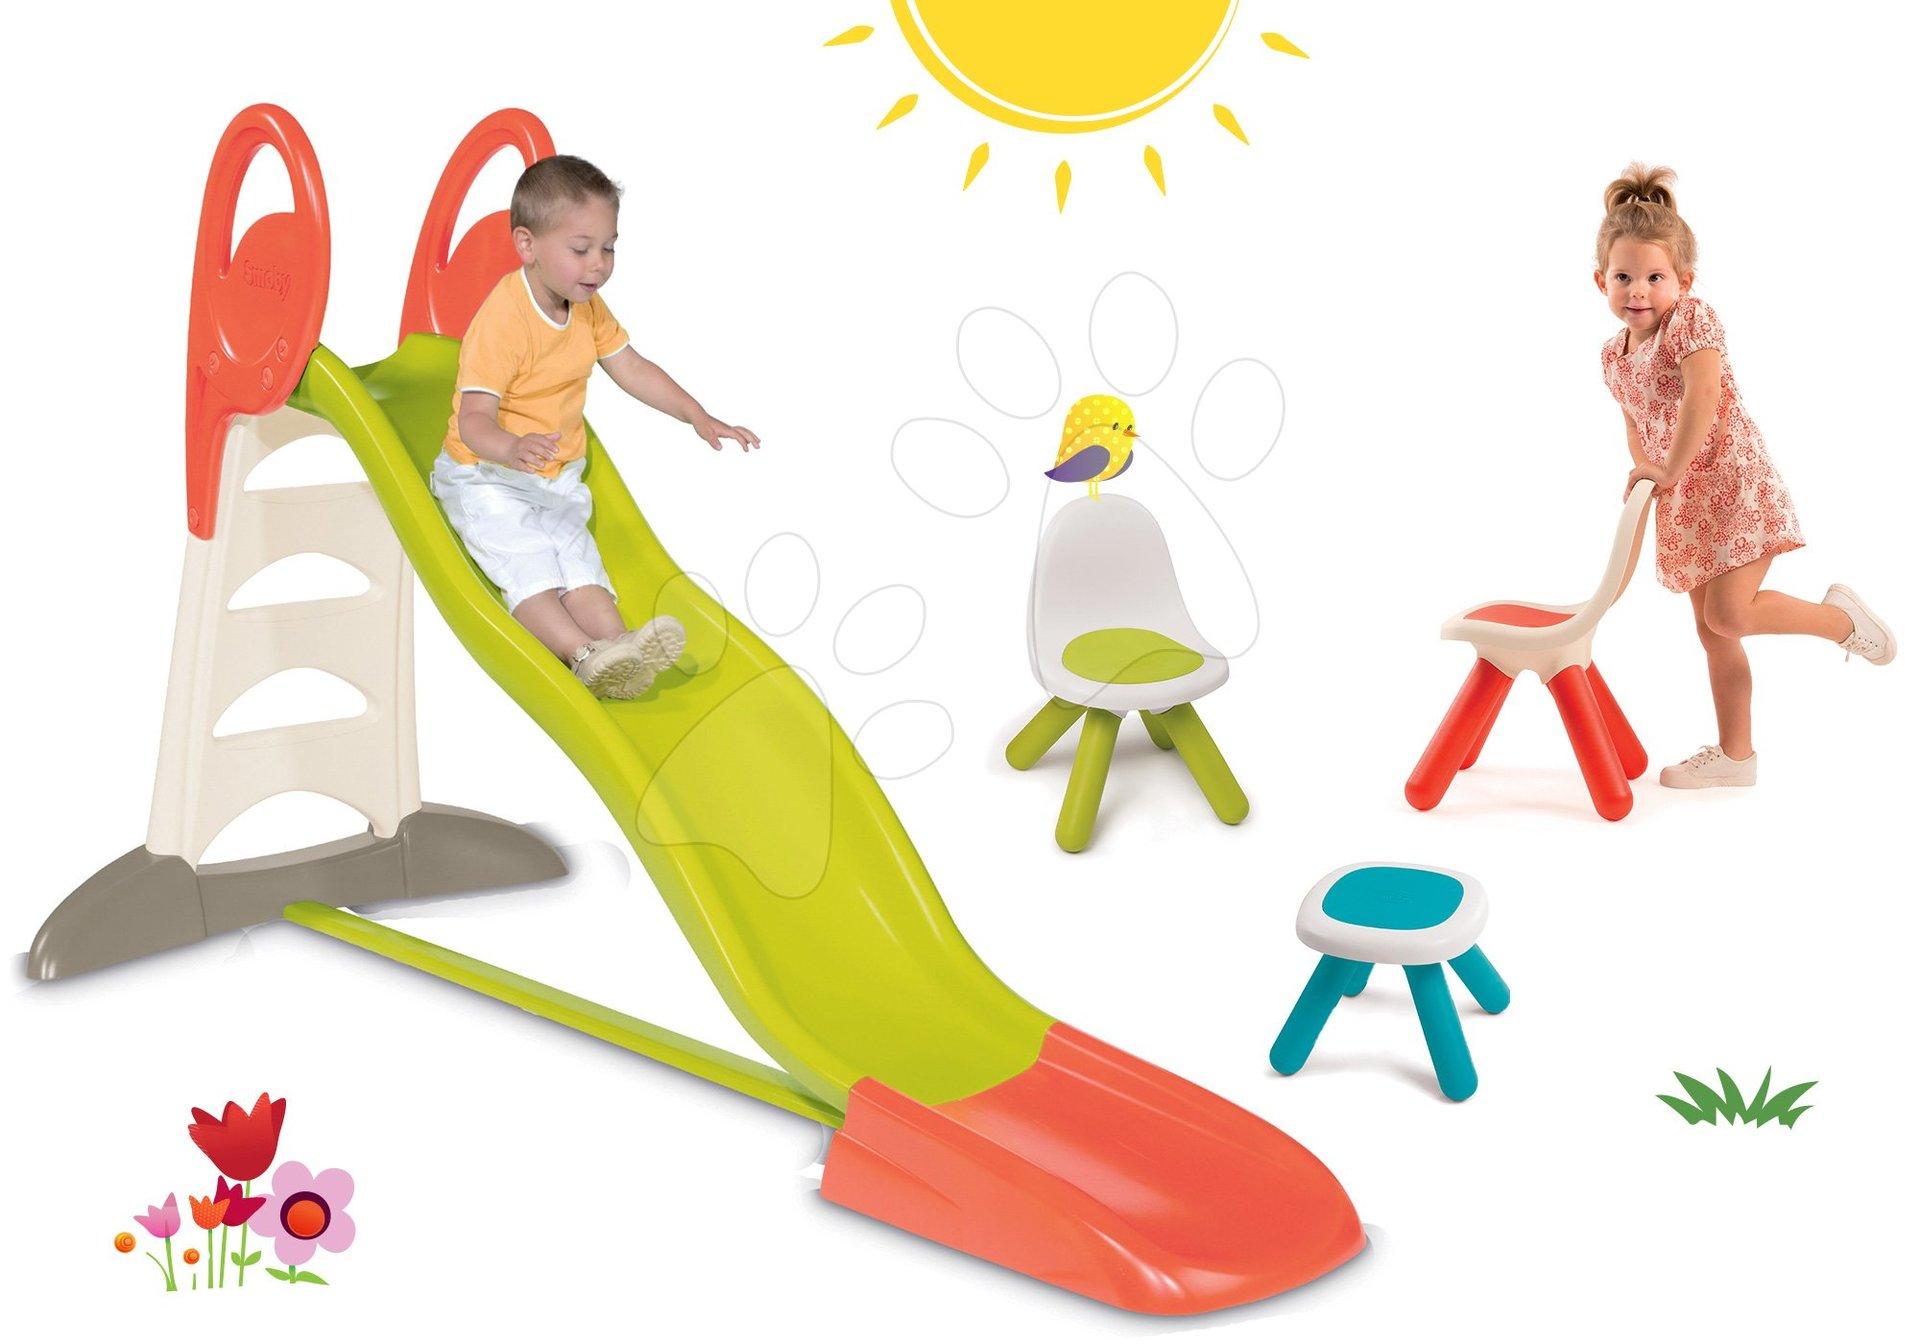 Set skluzavka Toboggan XL Smoby 2,3 m a Piknik stolek se dvěma židlemi KidChair